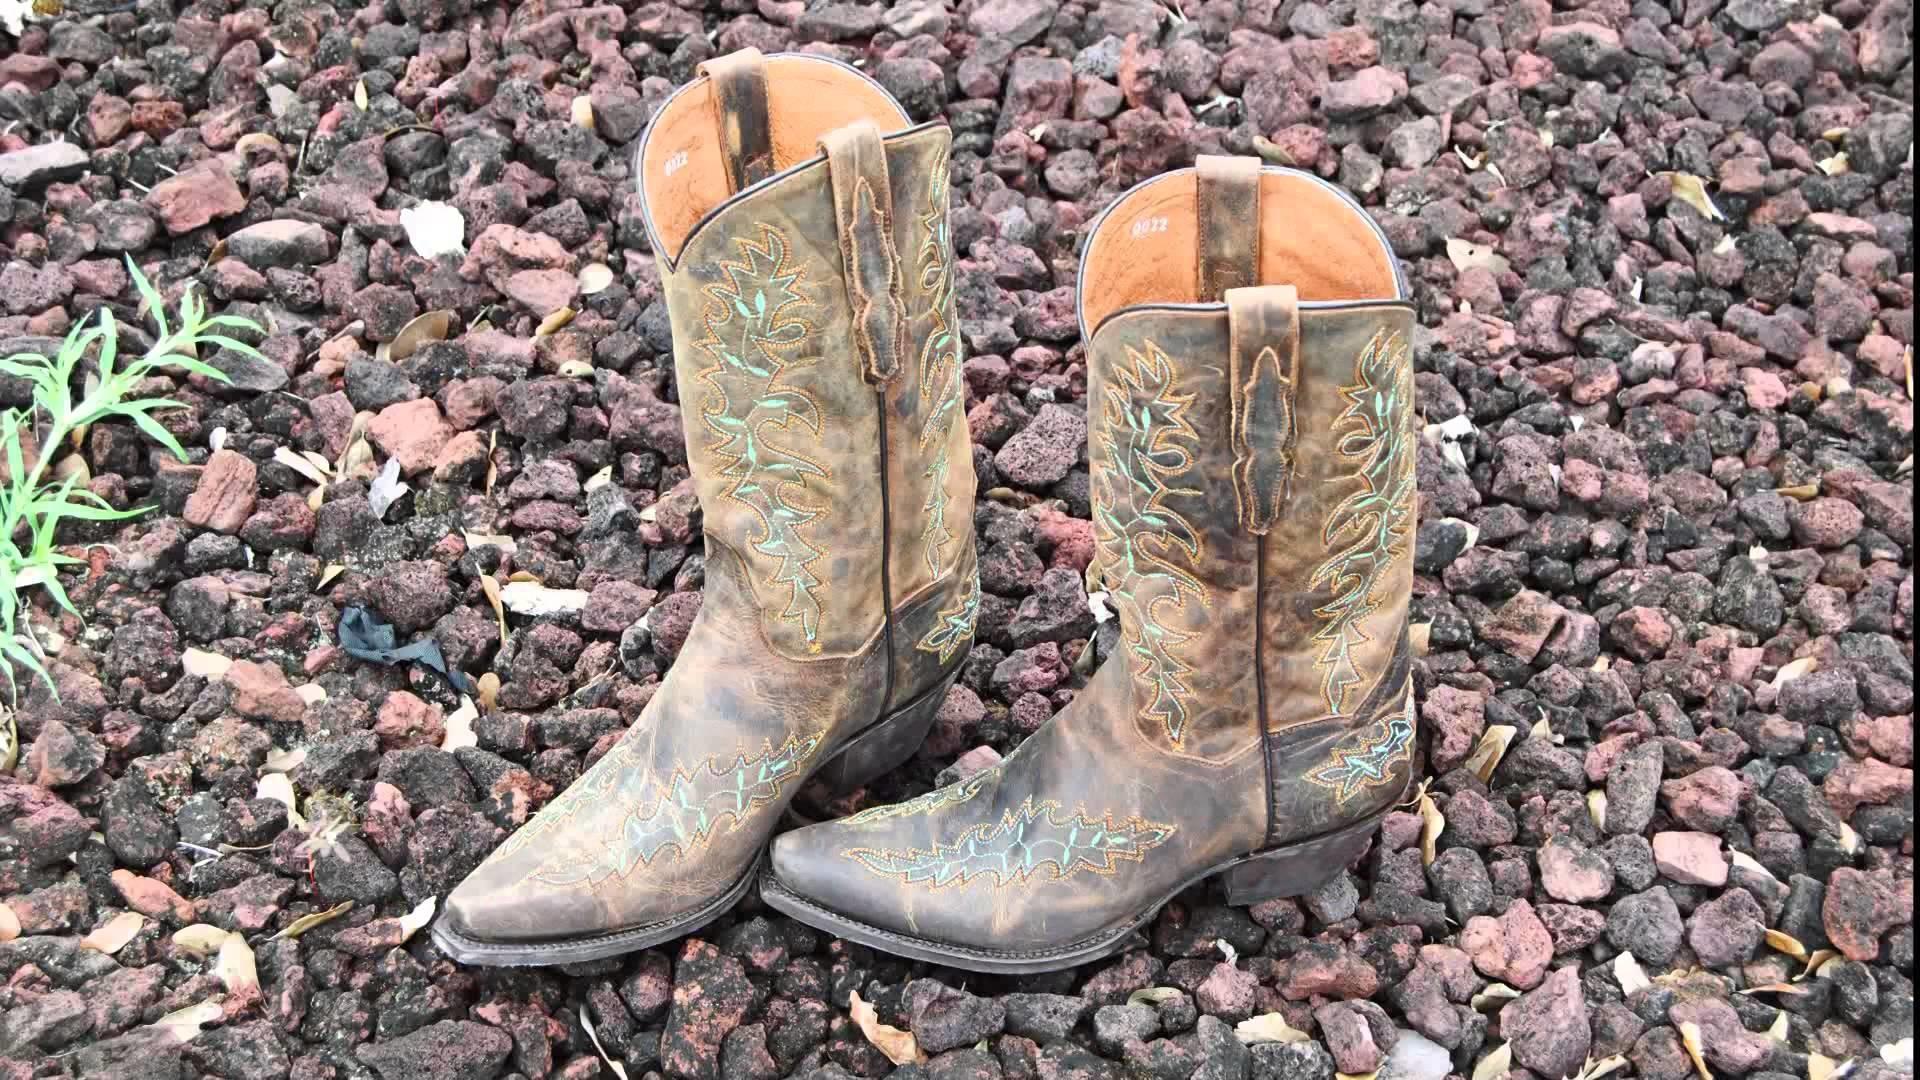 Country boots wallpaper 59 images - Jawga boyz wallpaper ...